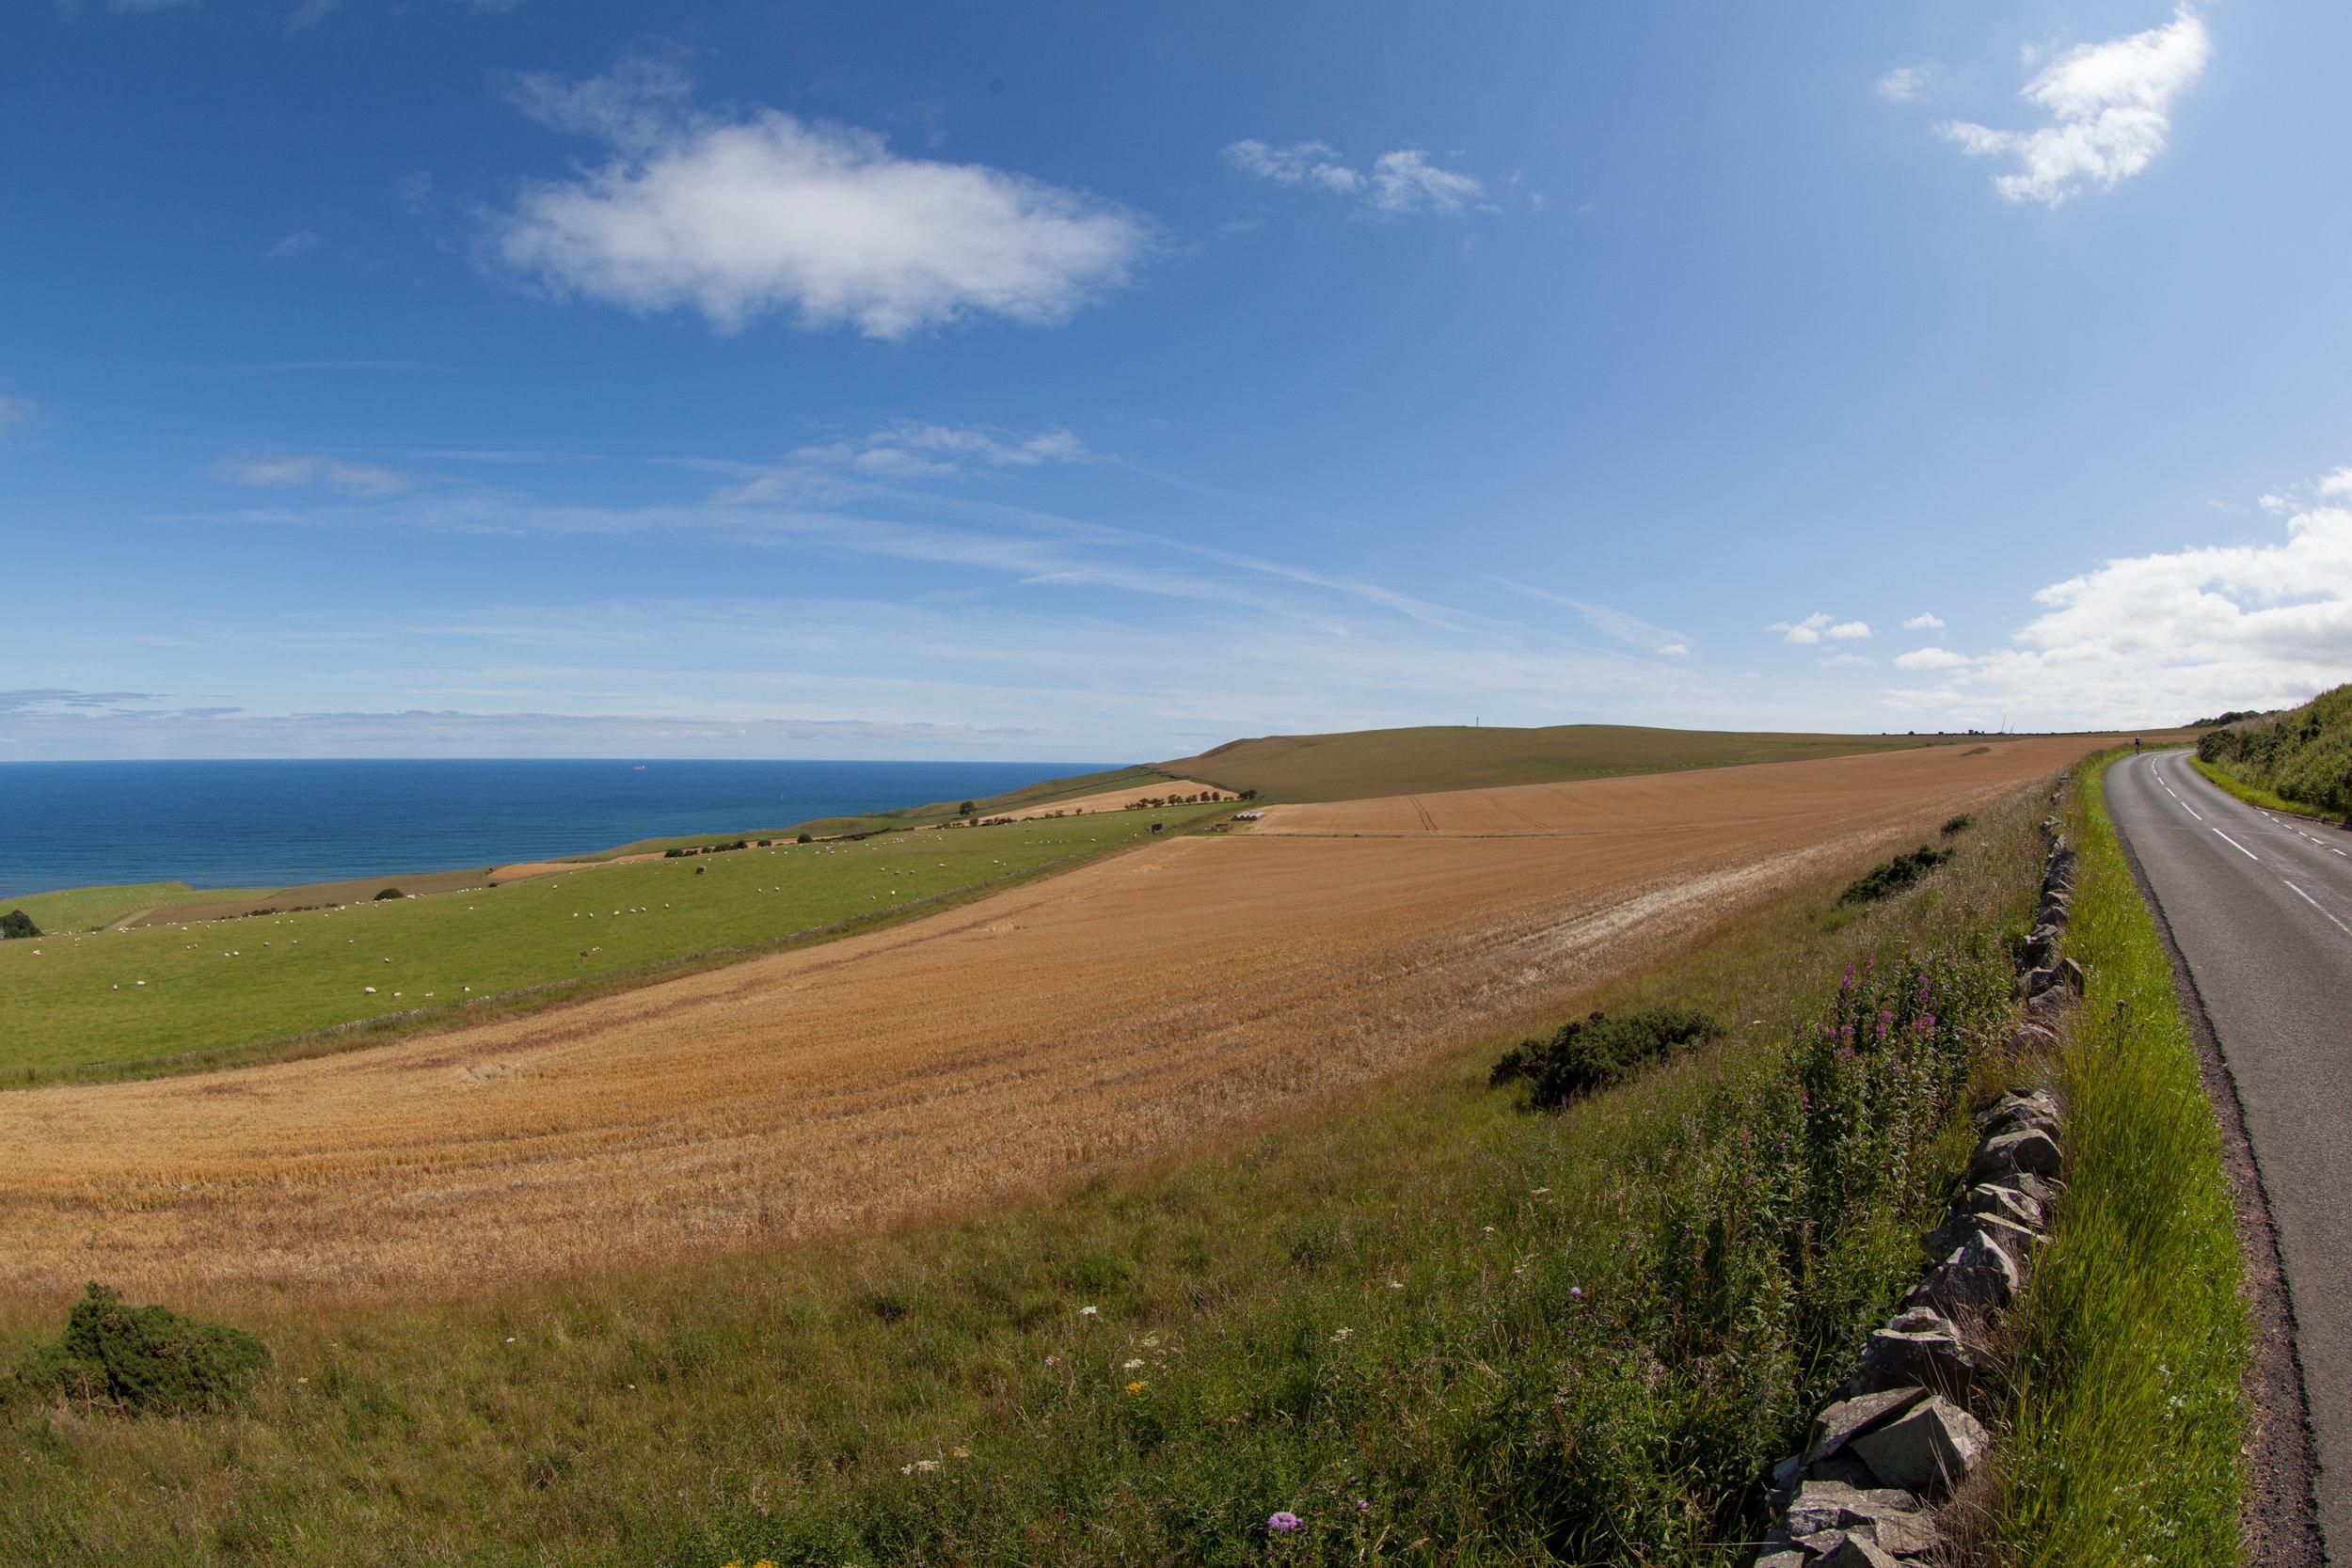 Coastal road, Scotland.